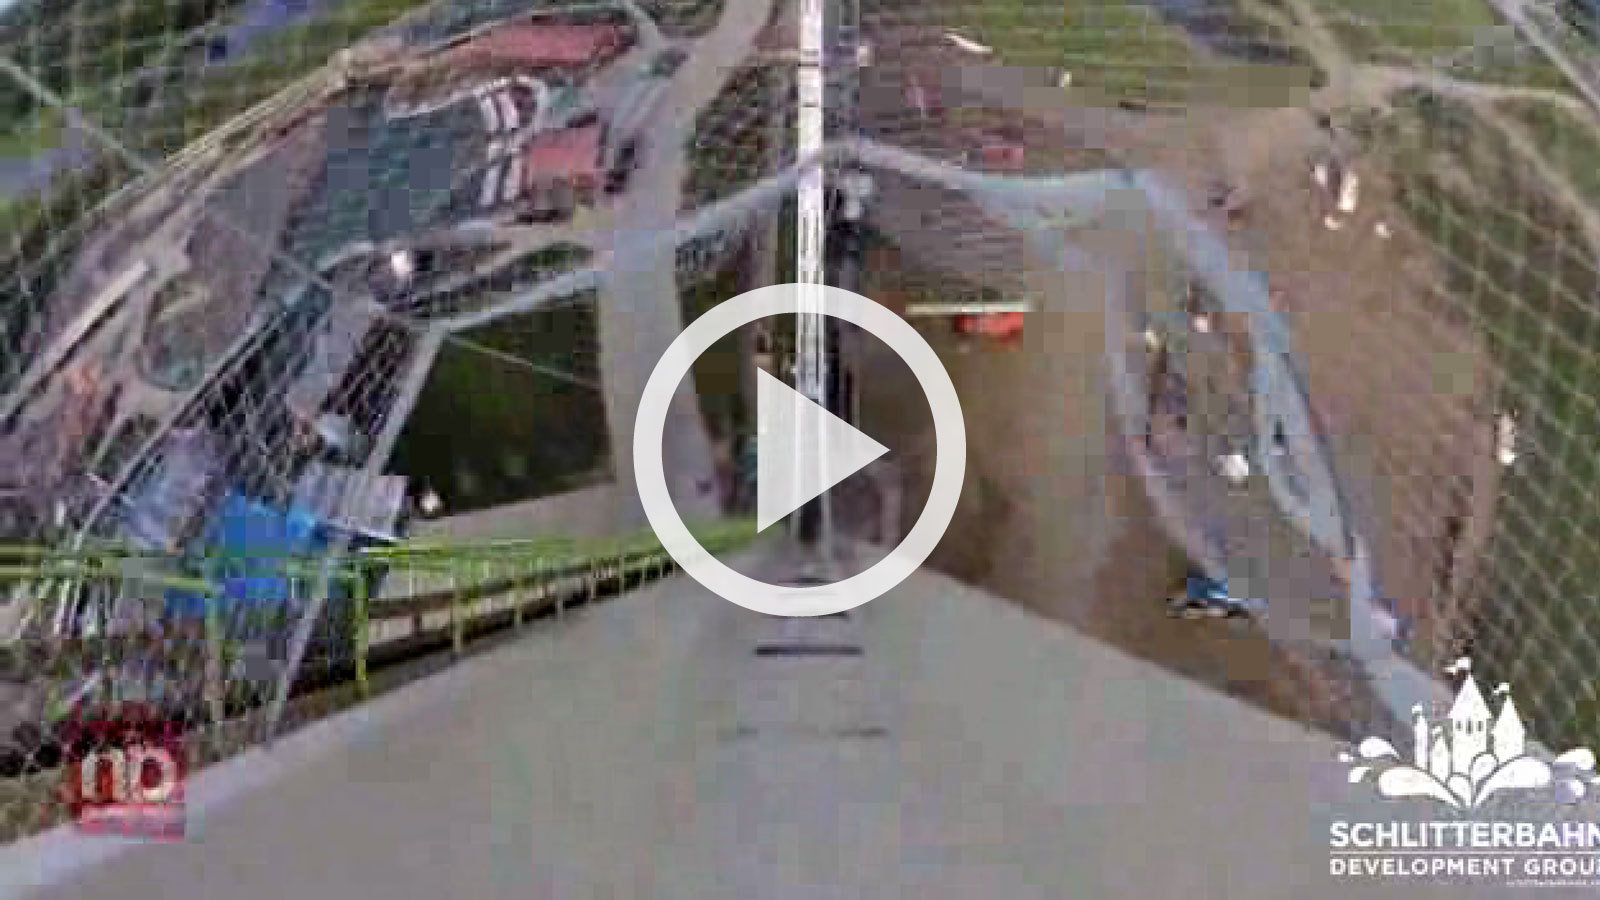 Tallest Waterslide In The World